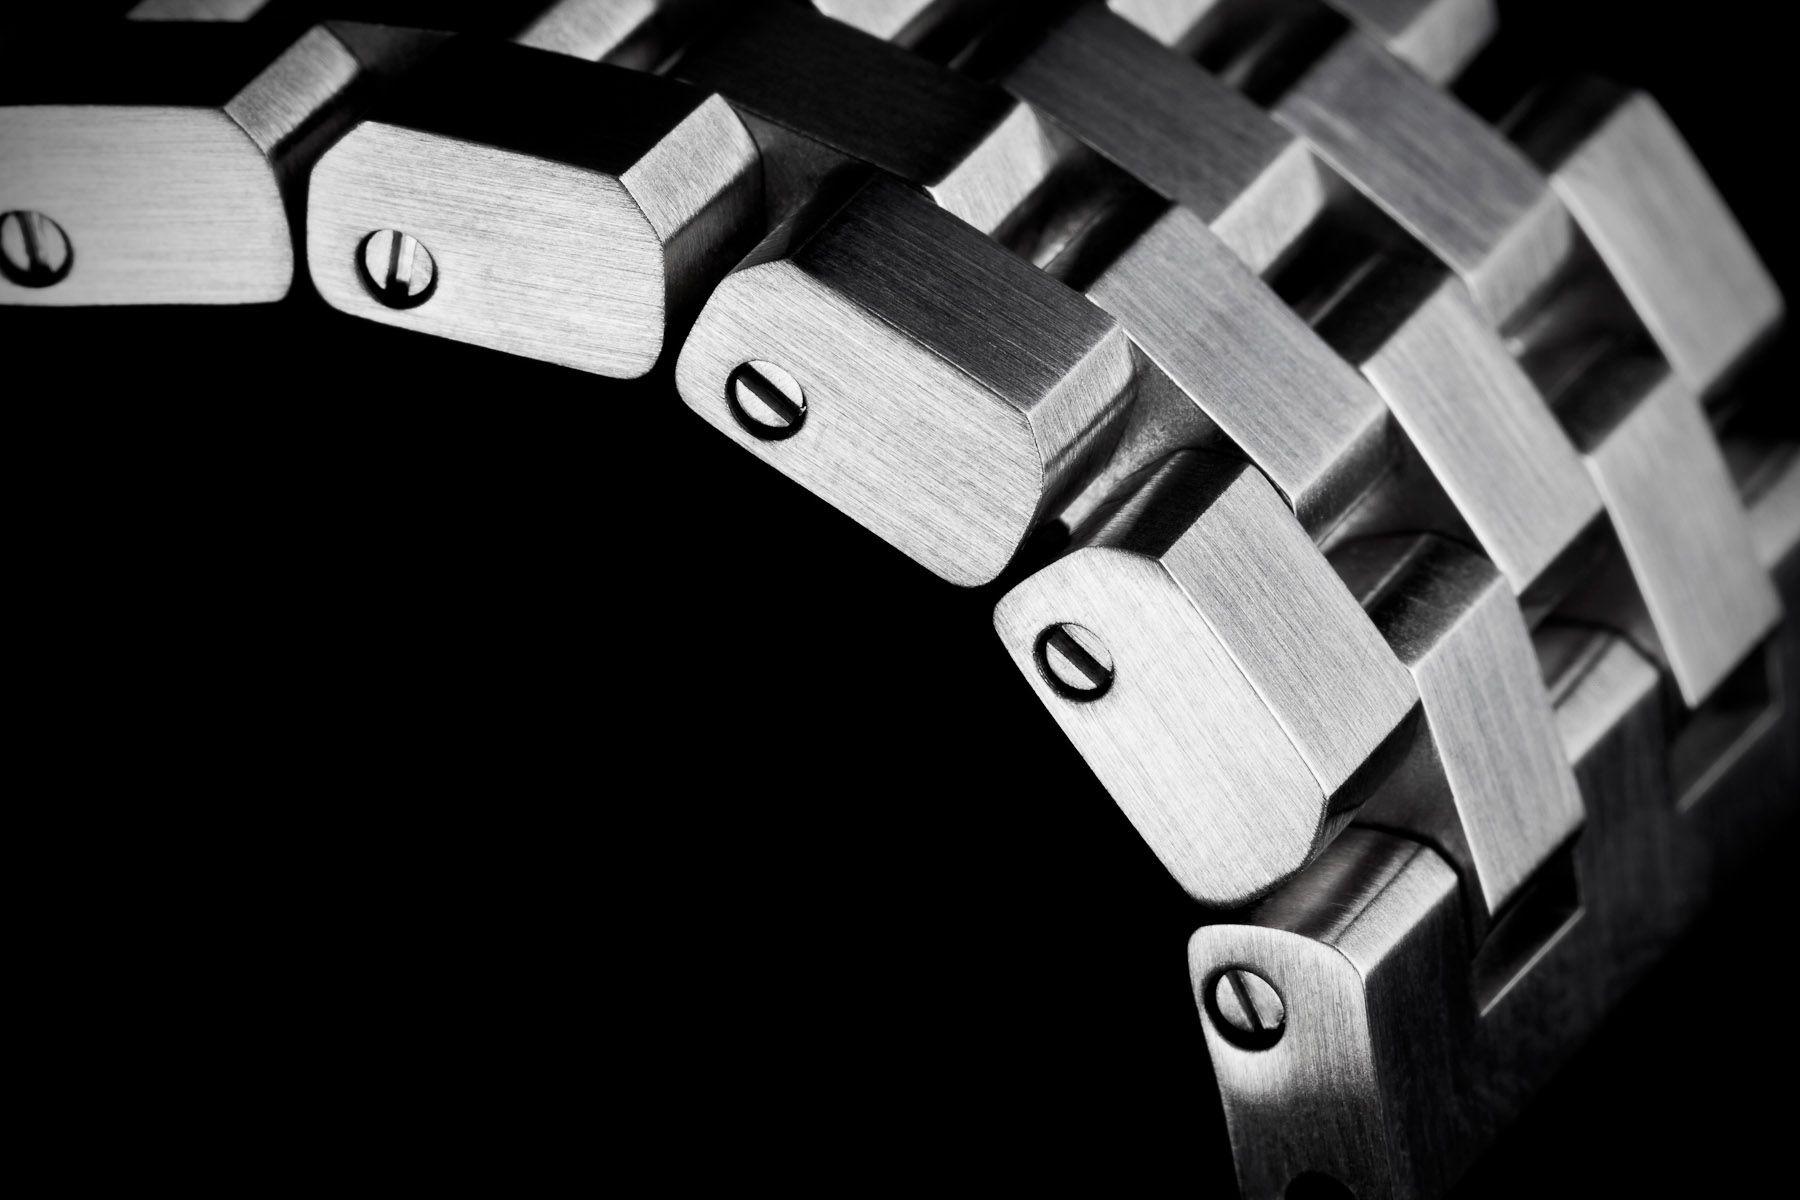 http://www.grayboxstudios.com/wp-content/uploads/2013/02/product_jewelry_reef_bracelet1.jpg